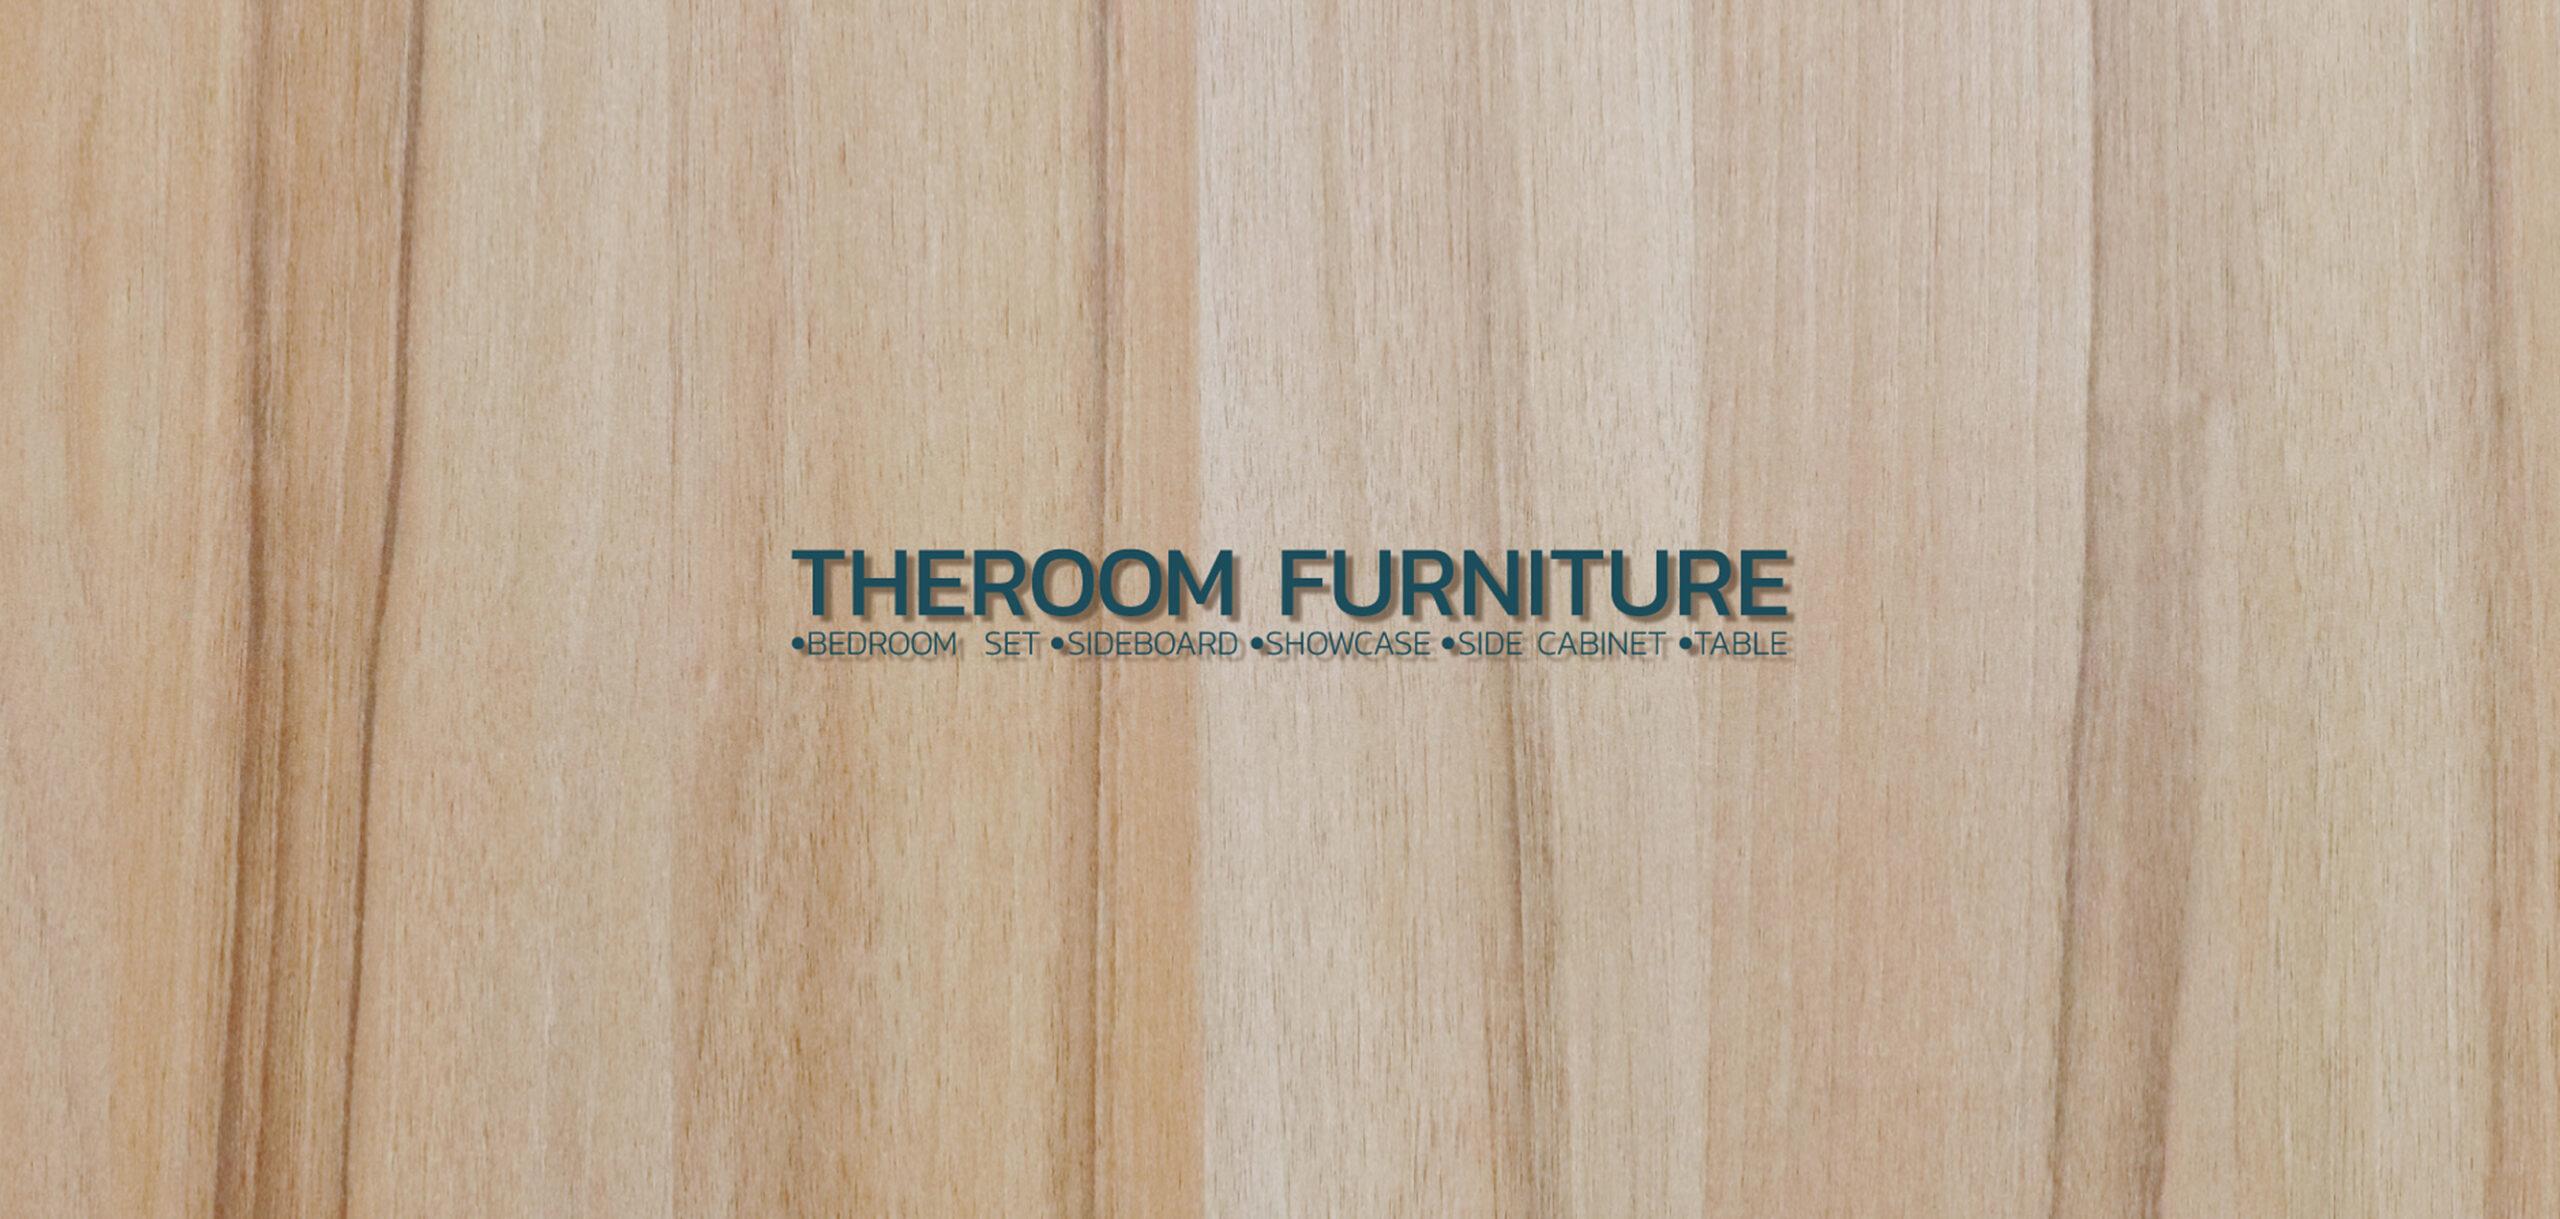 The Room Furniture เฟอร์นิเจอร์ นนทบุรี